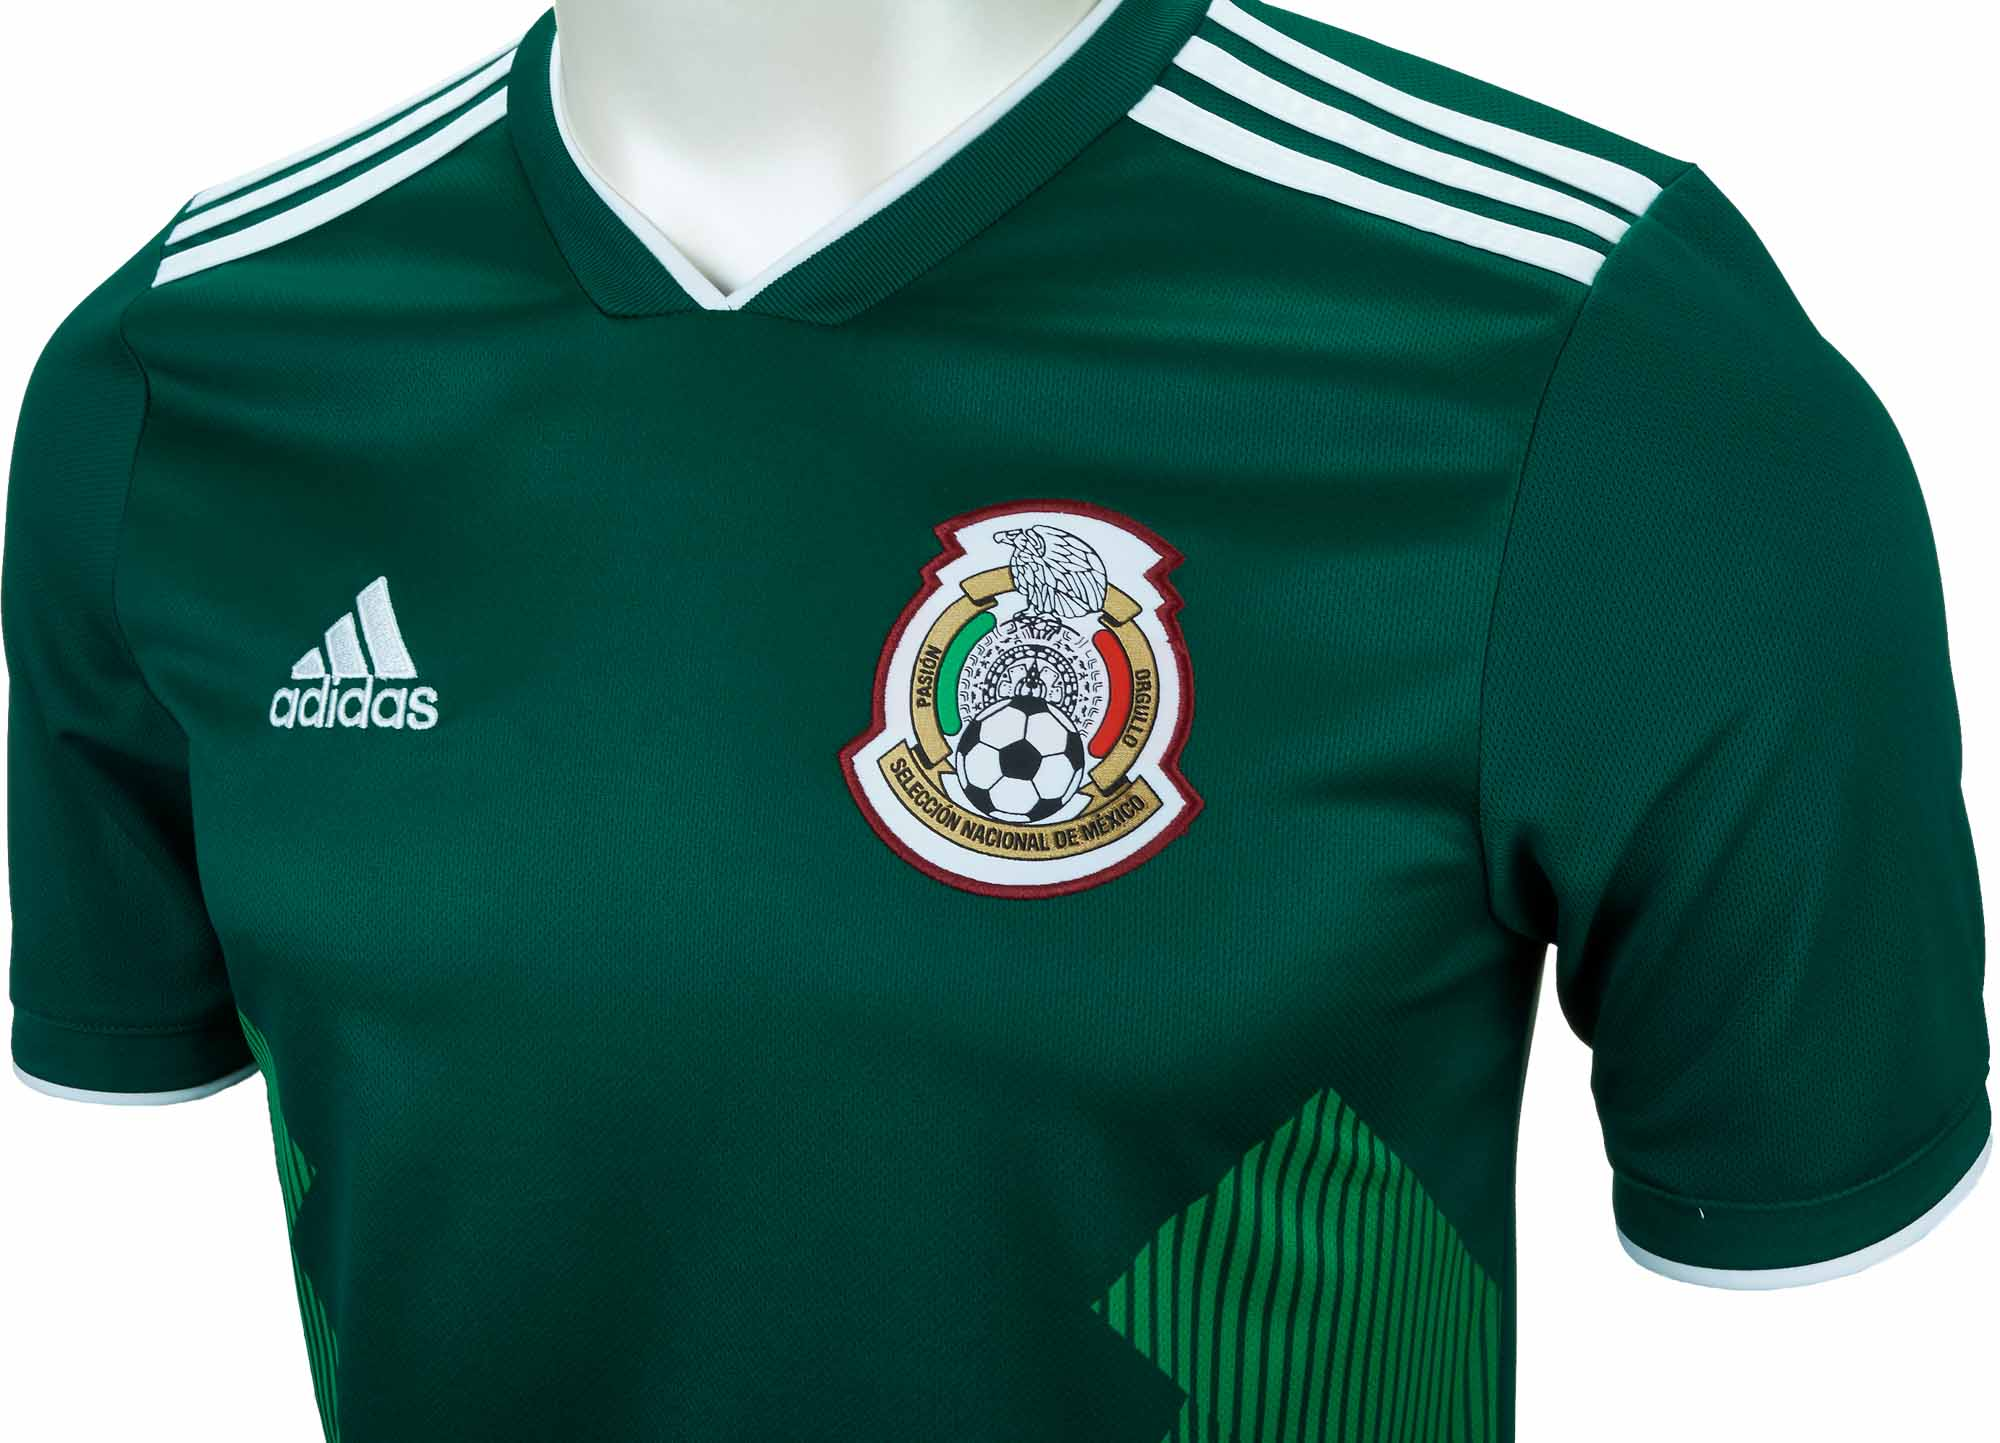 adidas Mexico Home Jersey 2018-19 - SoccerPro.com